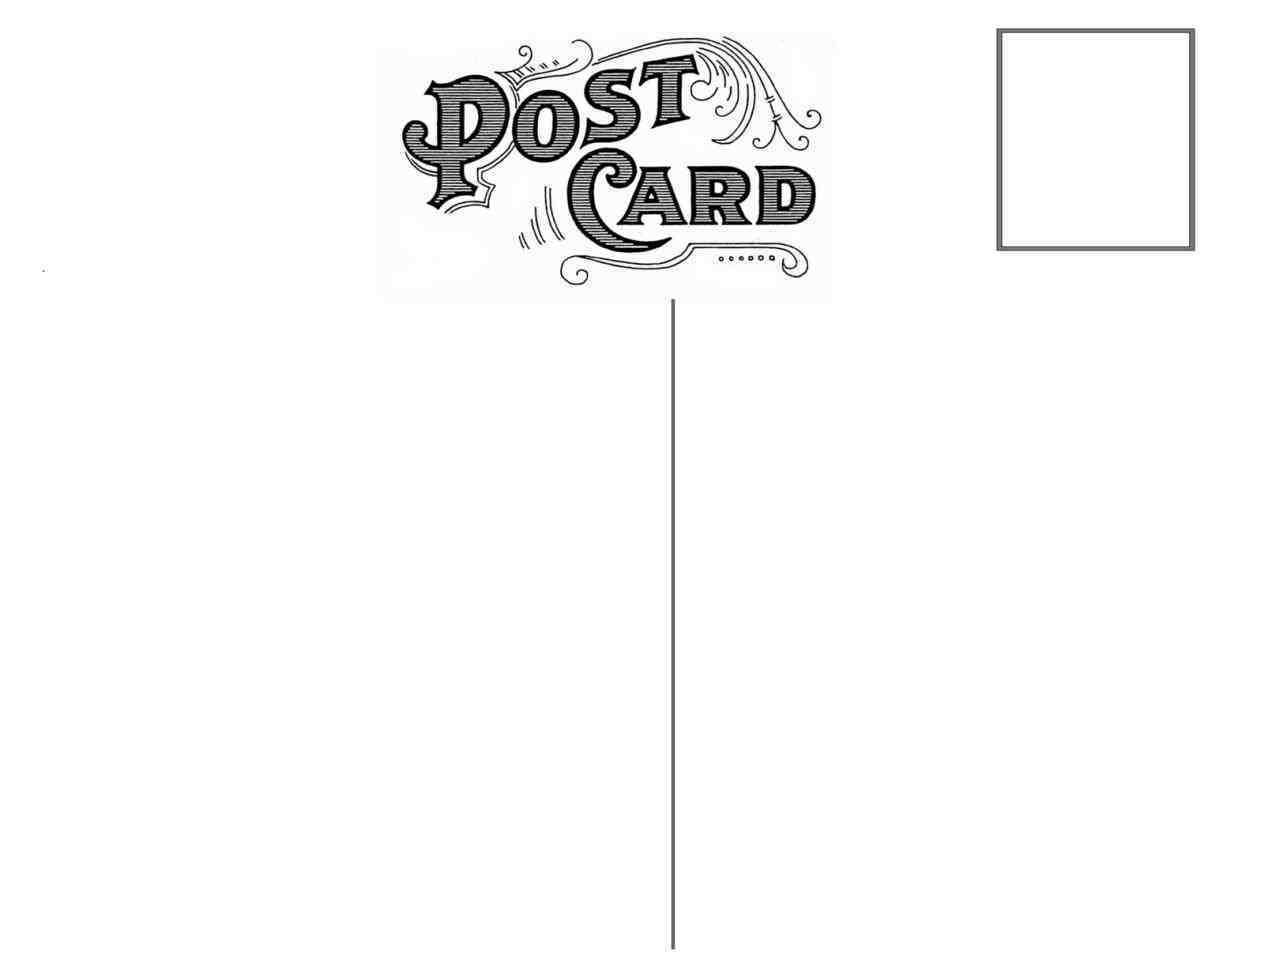 Omg rsvp postcards template my diy wedding free vintage postcard omg rsvp postcards template my diy wedding free vintage postcard back u peony rsvp templates how maxwellsz